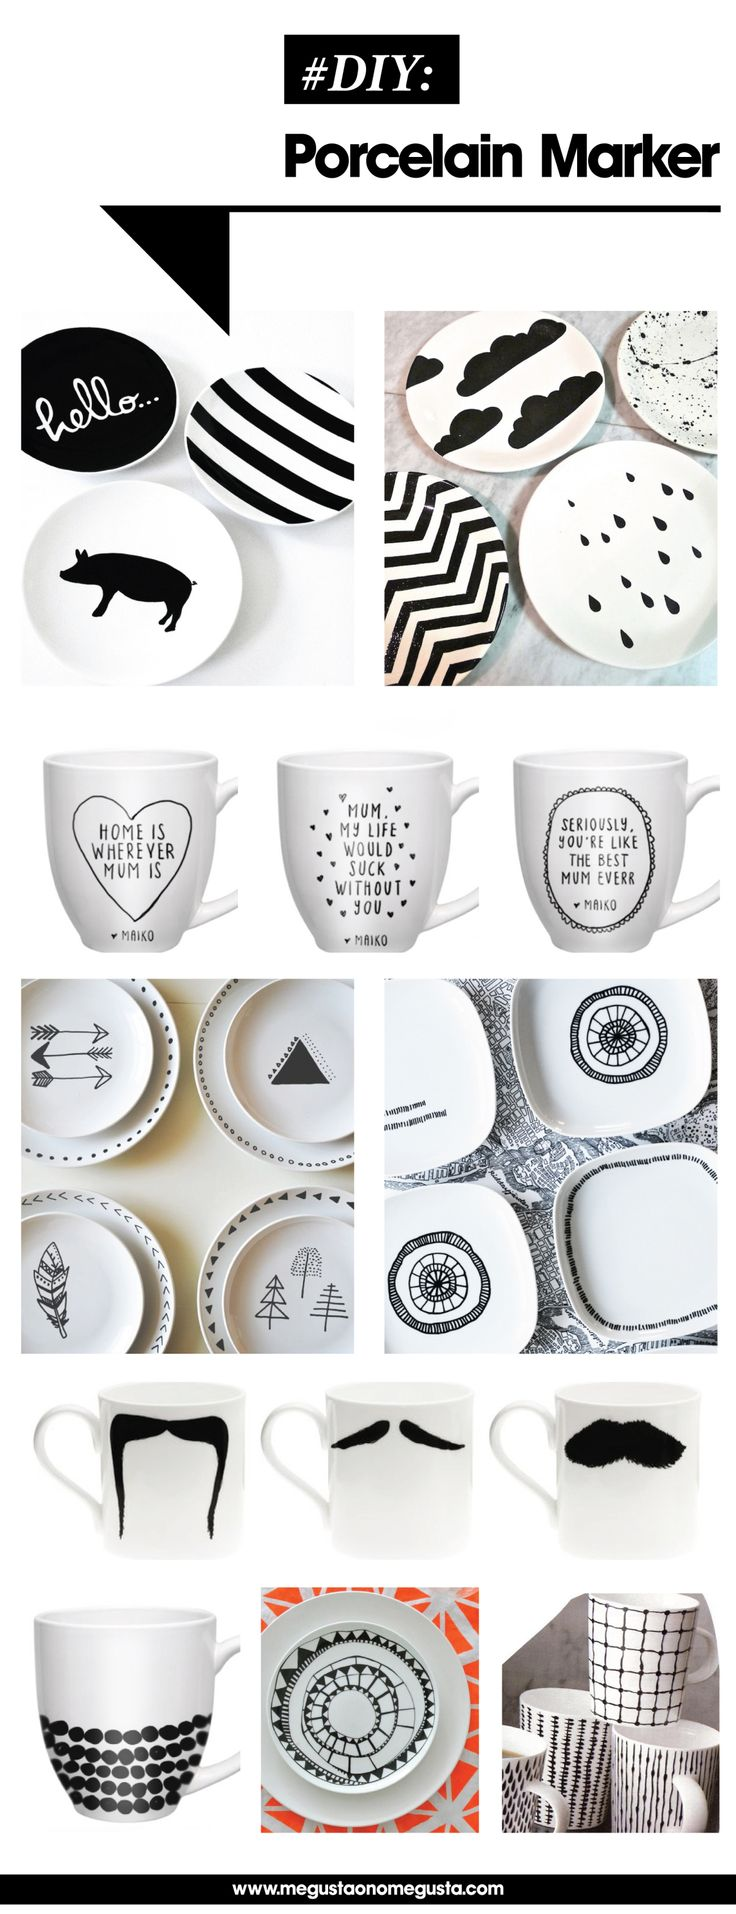 DIY porcelain marker inspo - megustaonomegusta blog